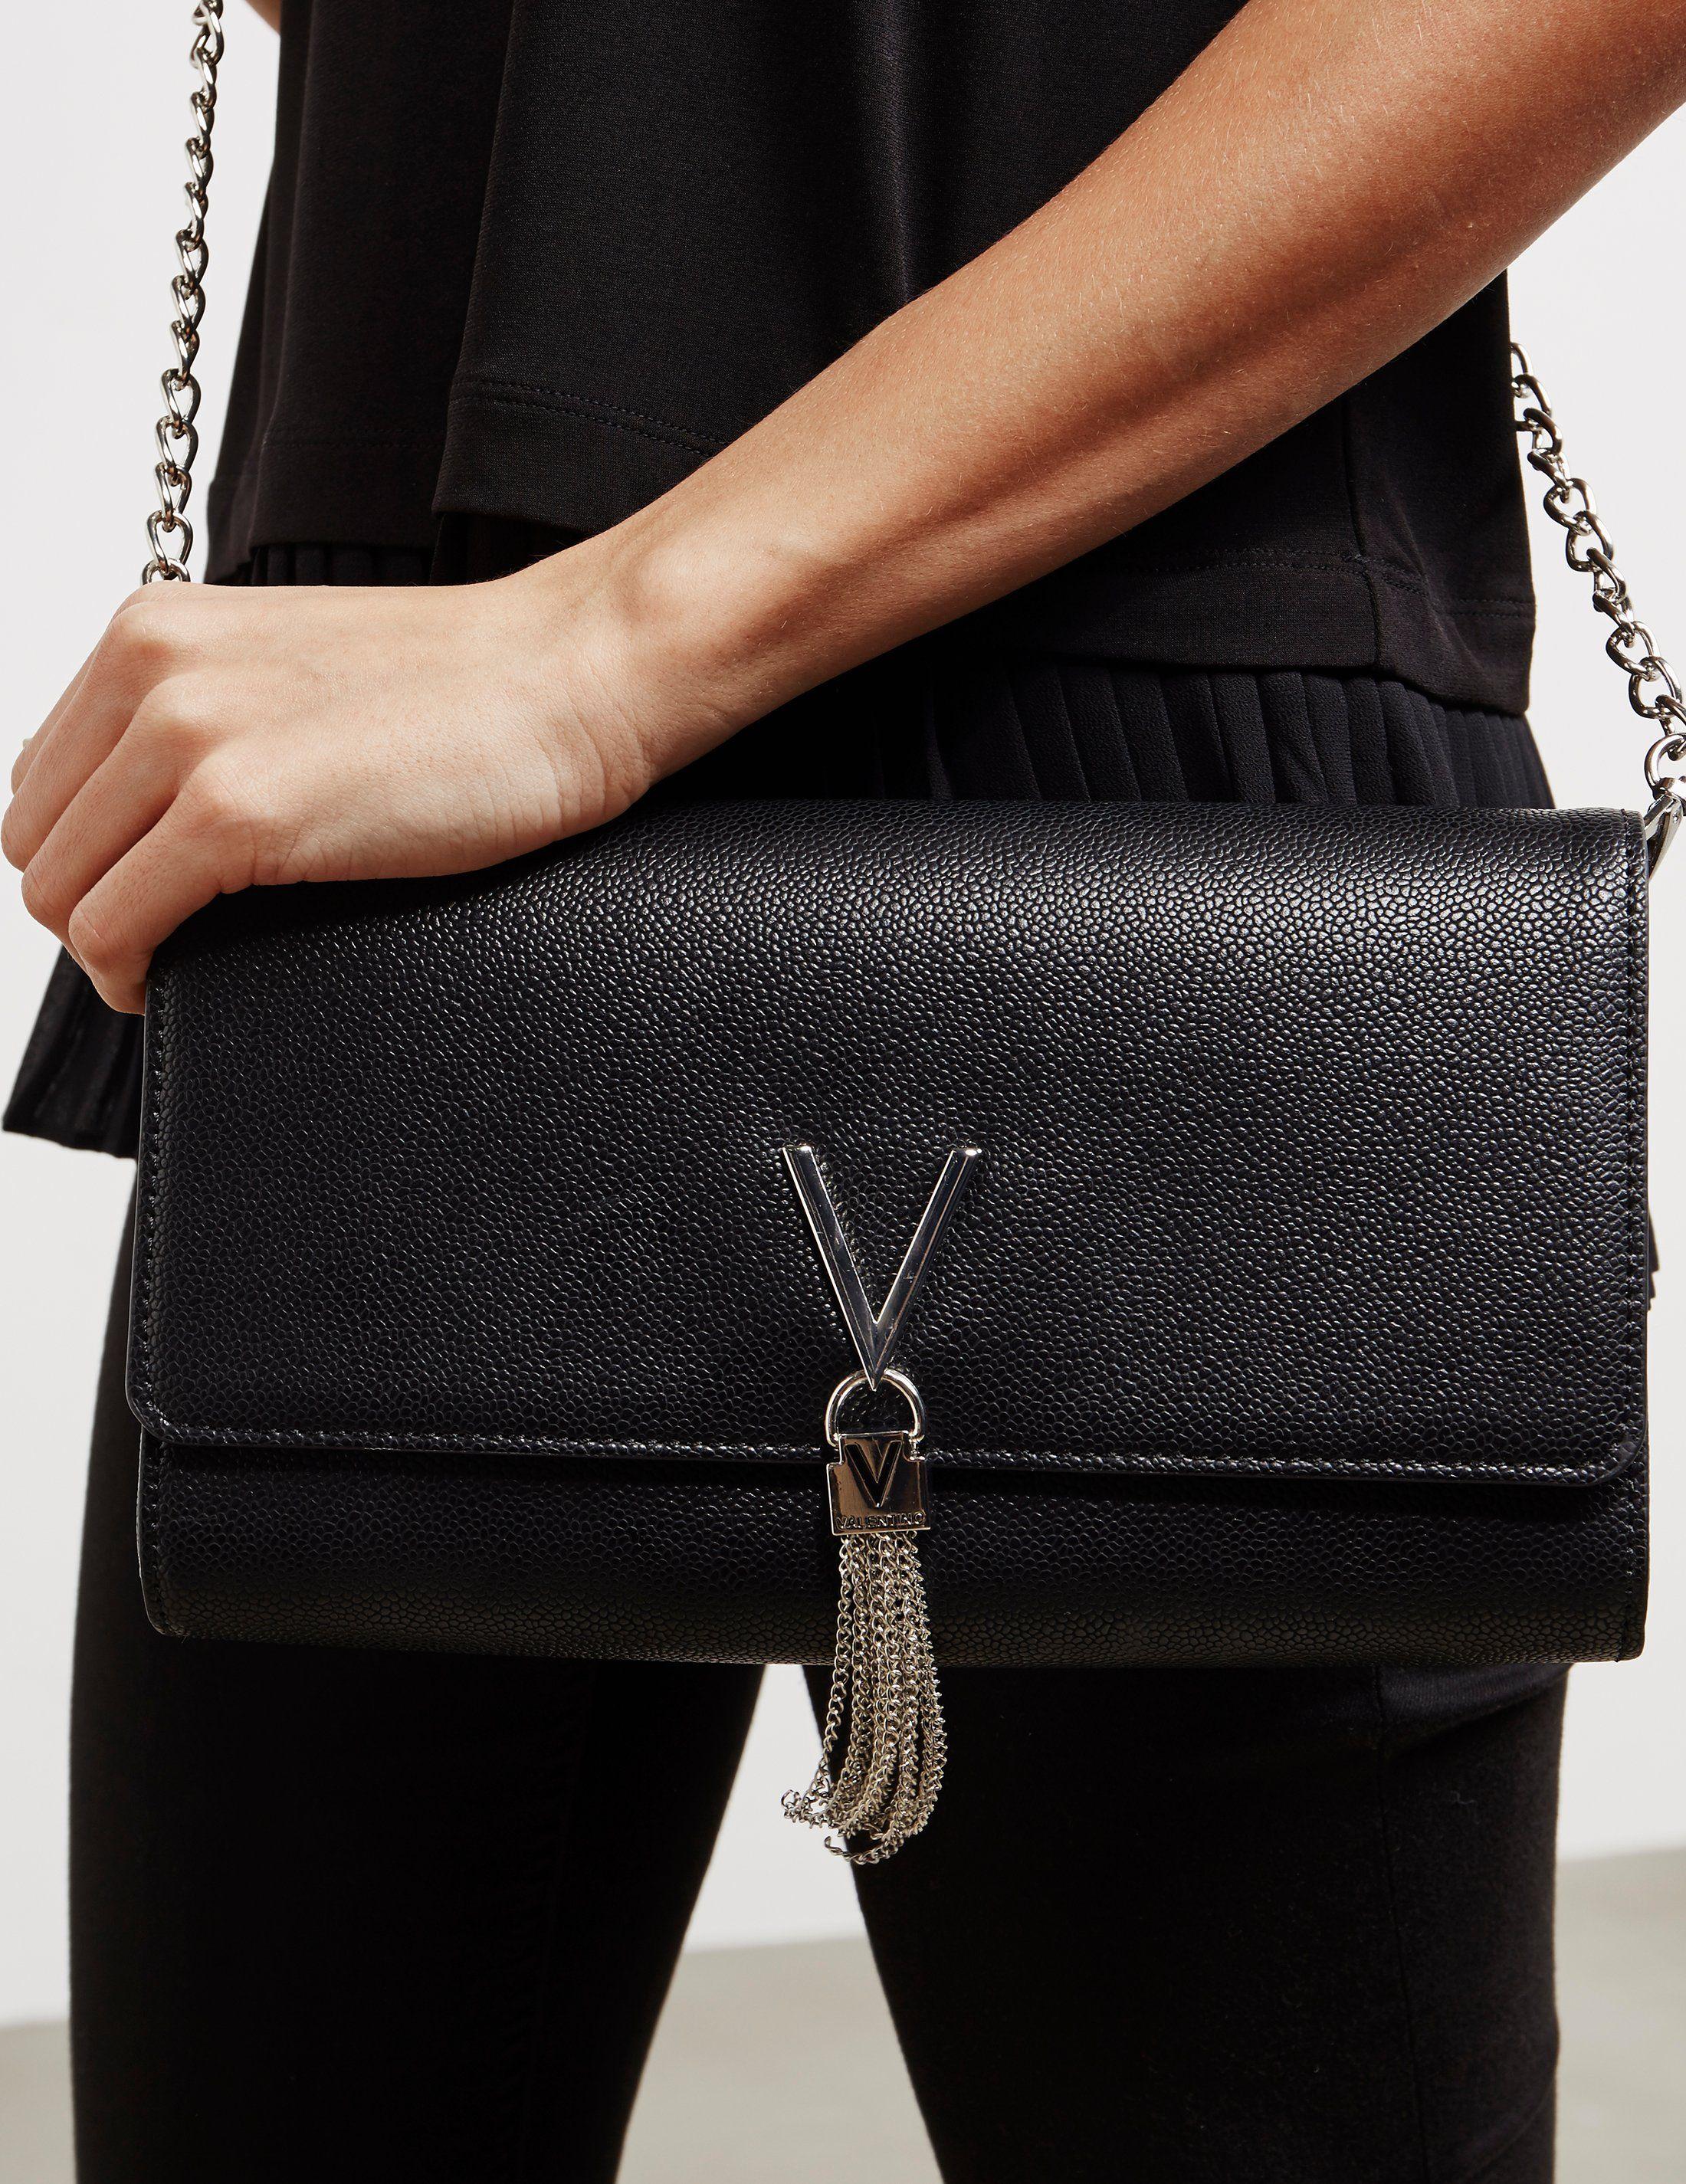 Valentino by Mario Valentino Divina Clutch Bag